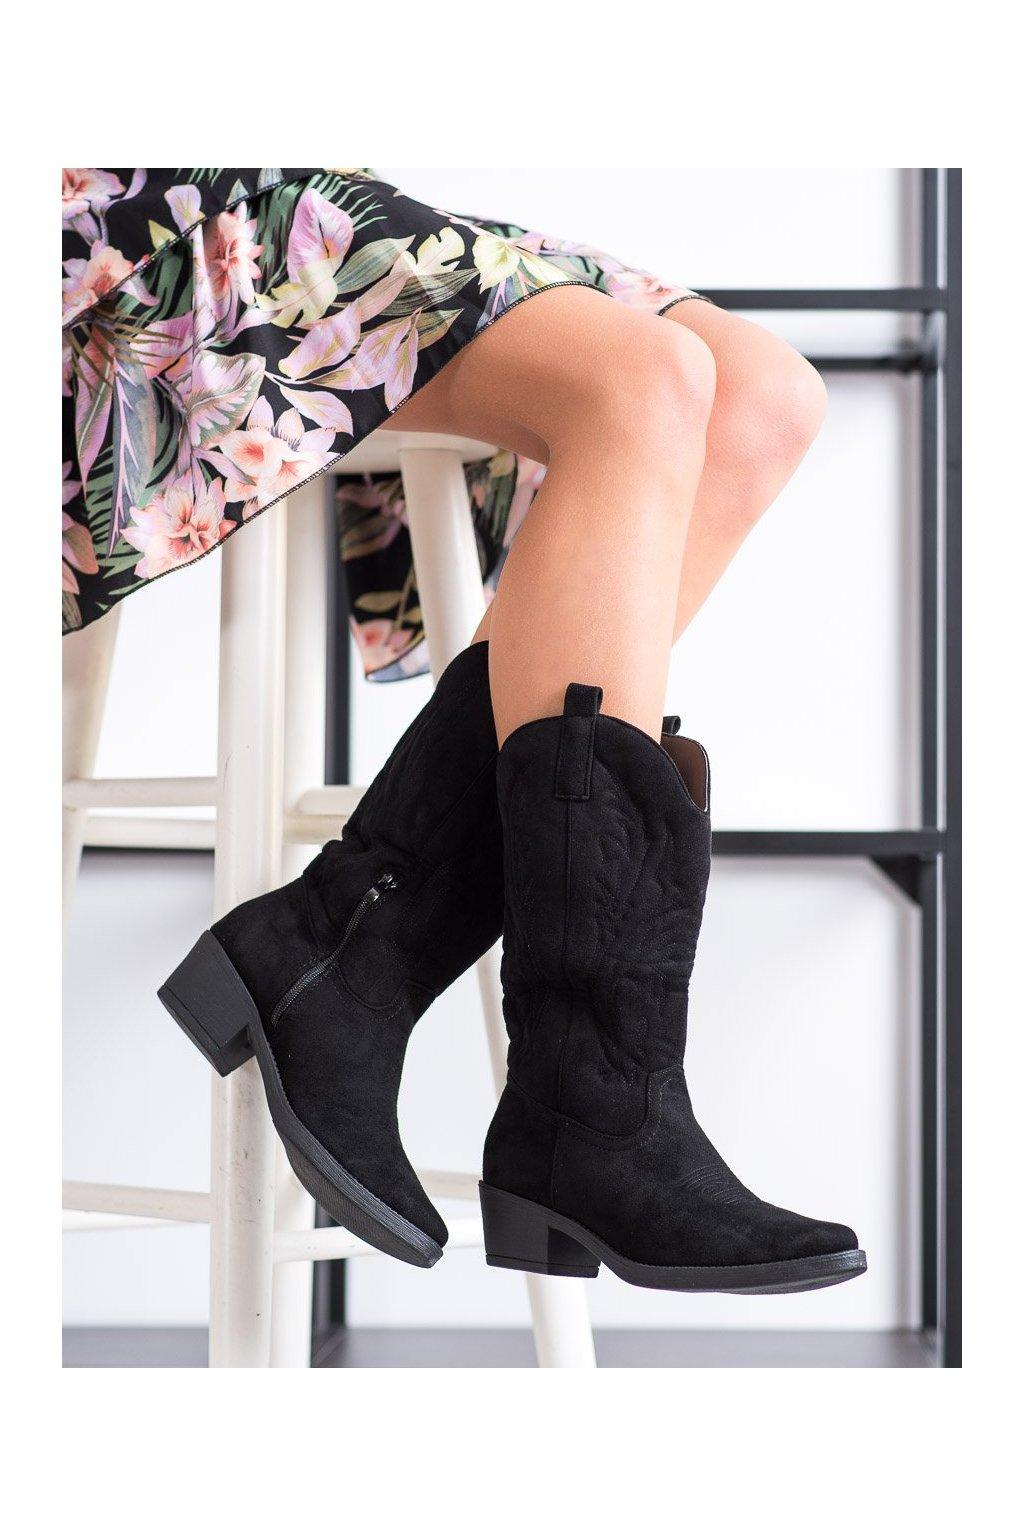 Čierne čižmy Ideal shoes kod MR-1881B